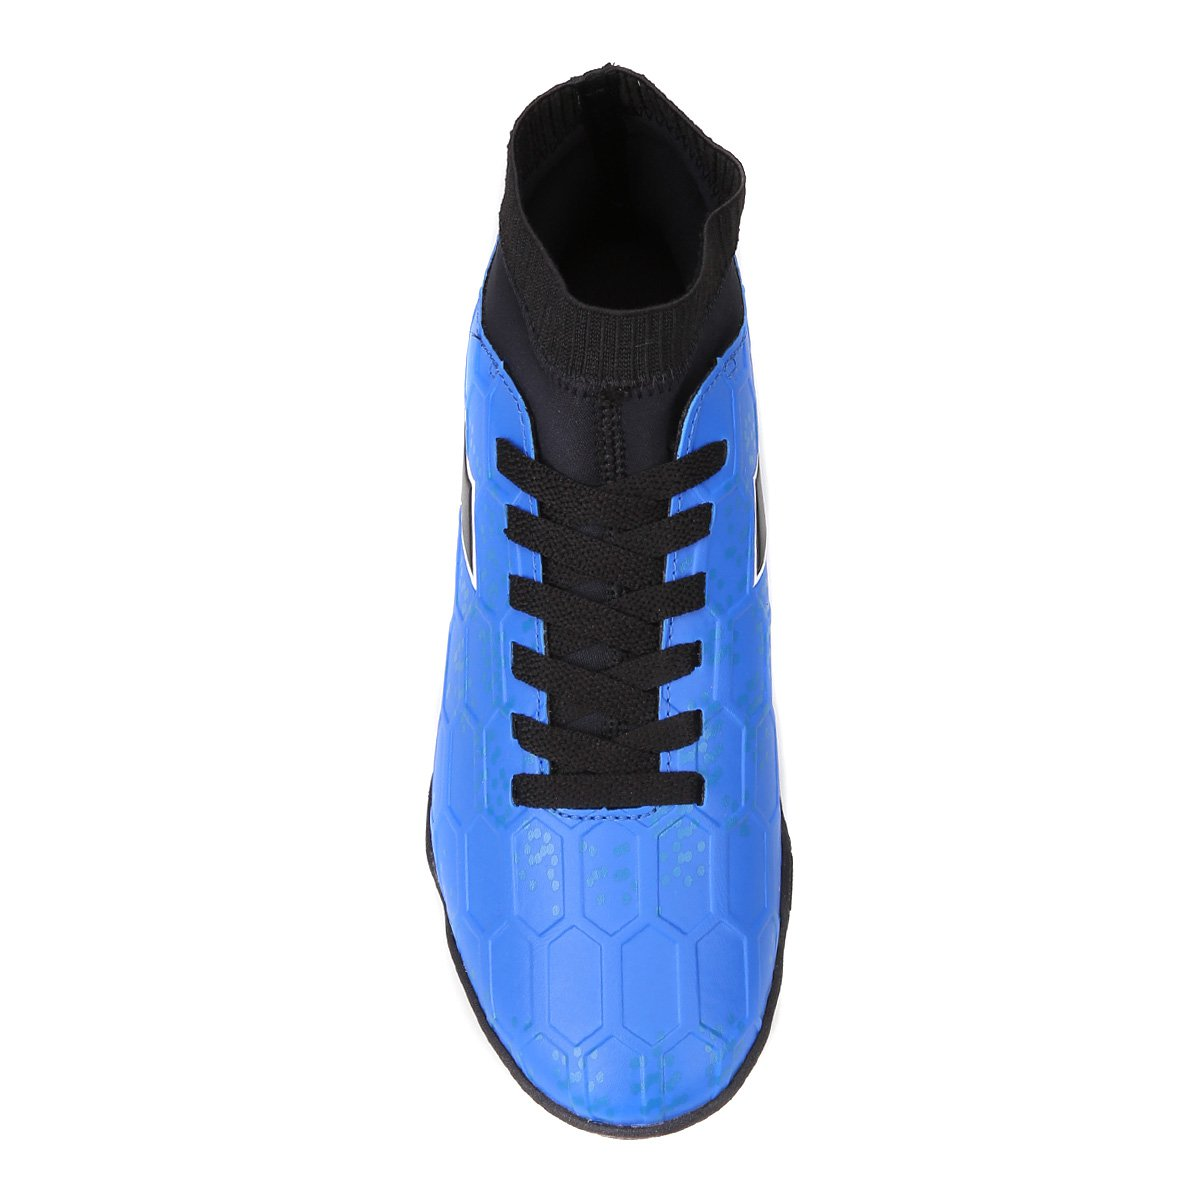 Chuteira Society Diadora Armada Turf - Azul e Preto - Compre Agora ... e6c6f67396f9c